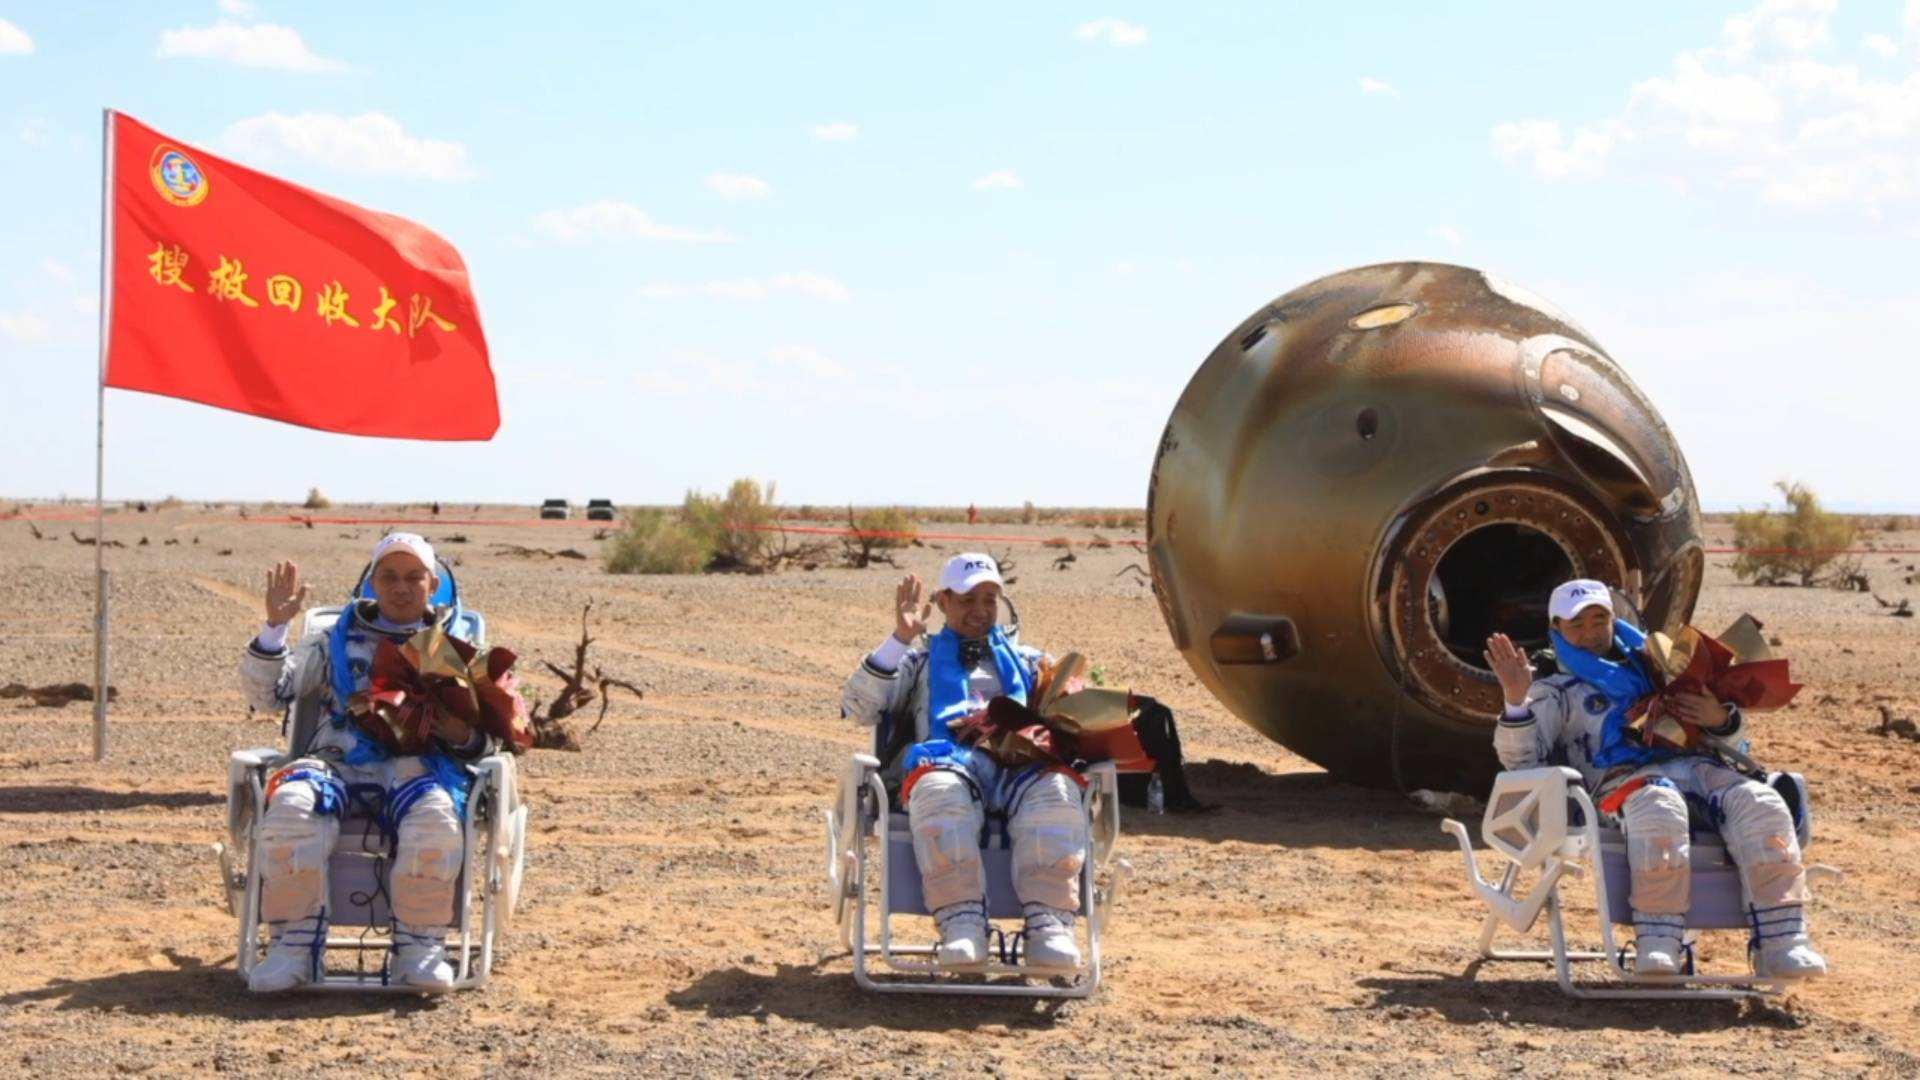 GLOBALink | Shenzhou-12 crew returns home